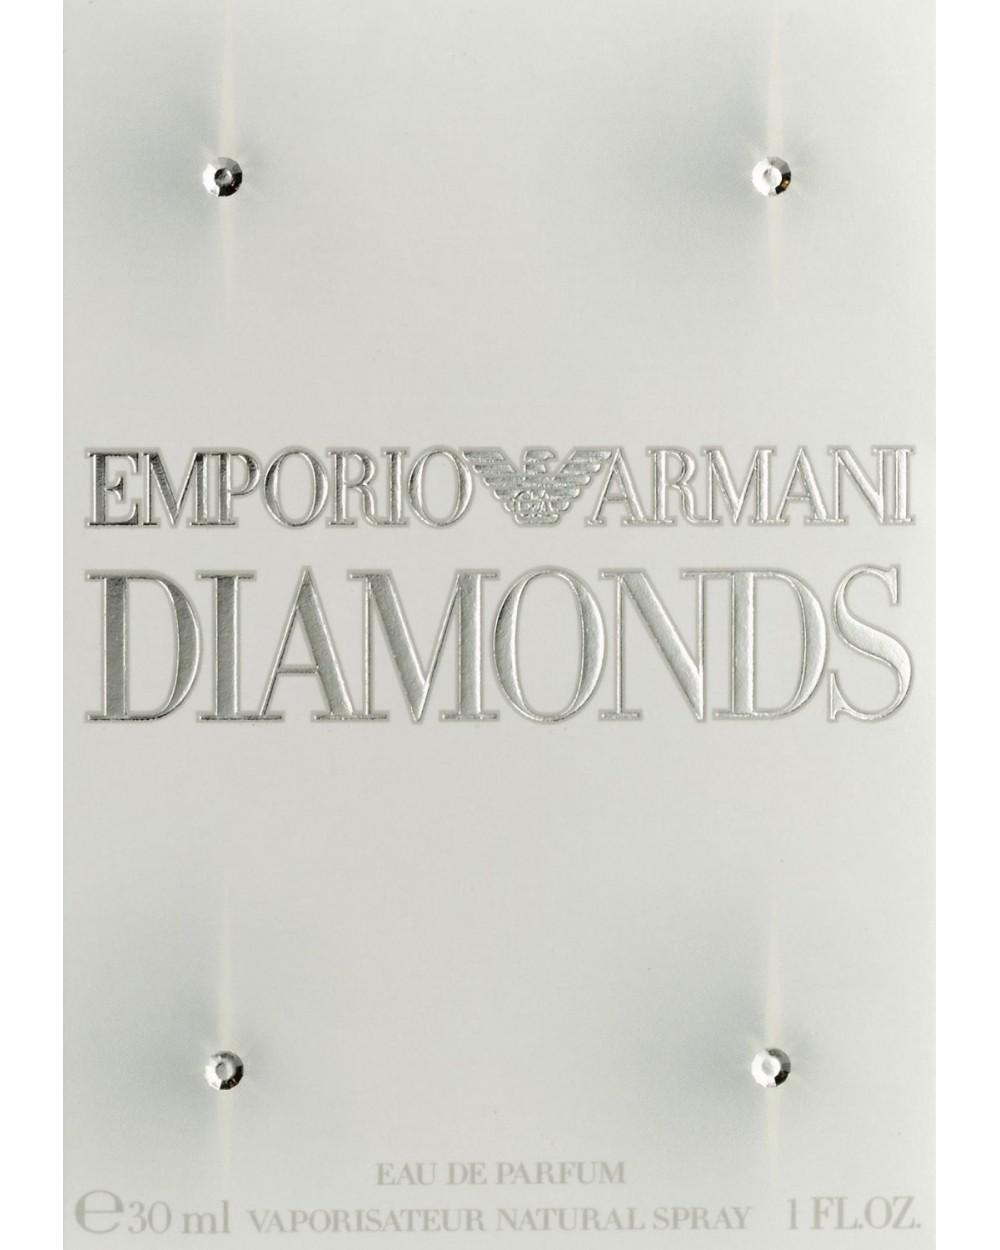 Emporio Armani Diamonds Femme Eau De Parfum 30ml Sovrana Parfums